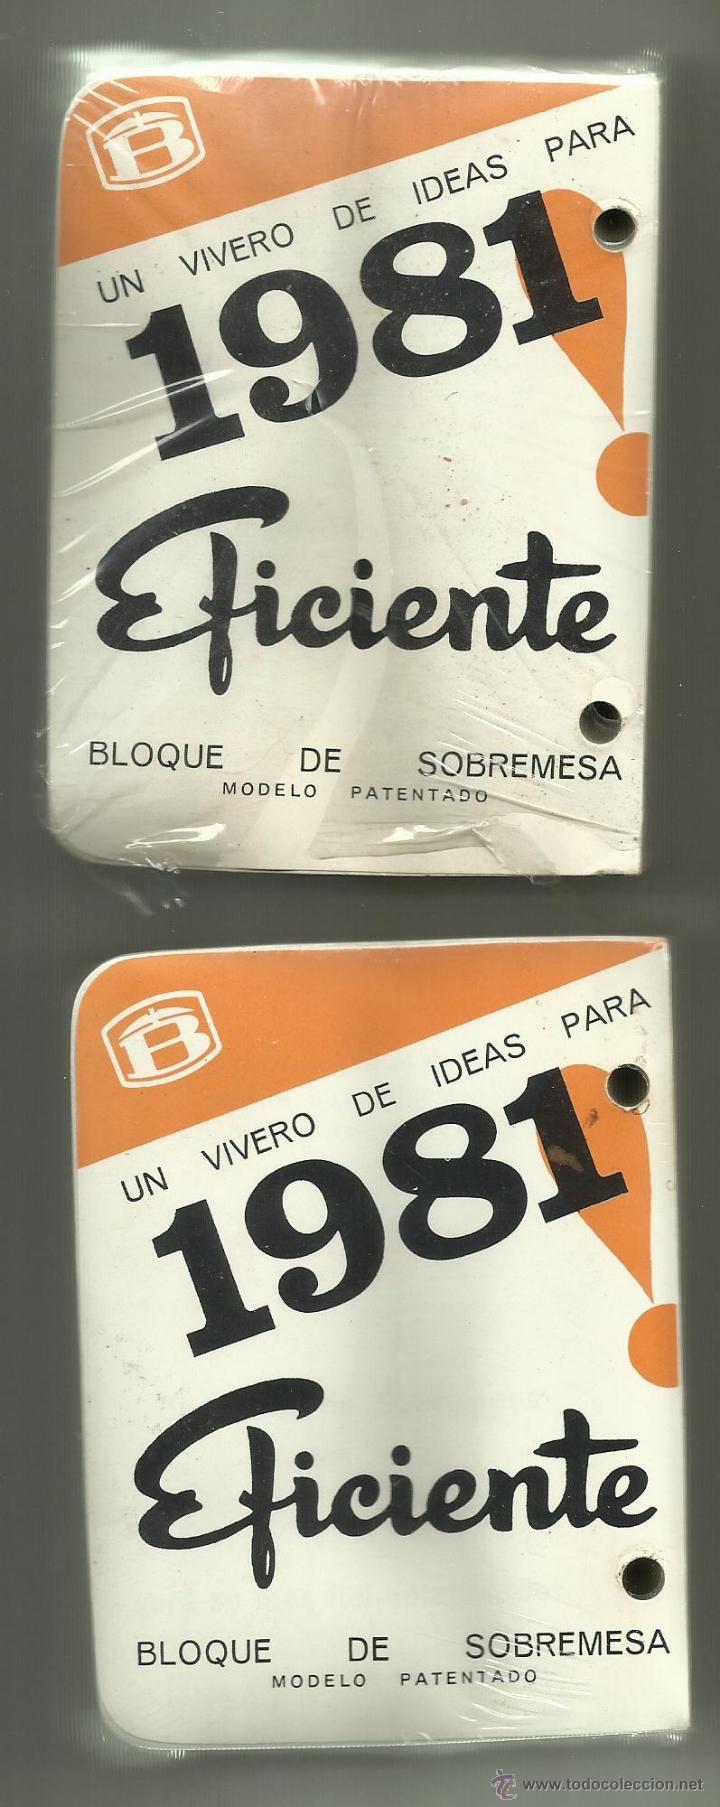 BLOQUE DE SOBREMESA (2) CALENDARIO DE 1981, SIN ESTRENAR. (Coleccionismo - Calendarios)